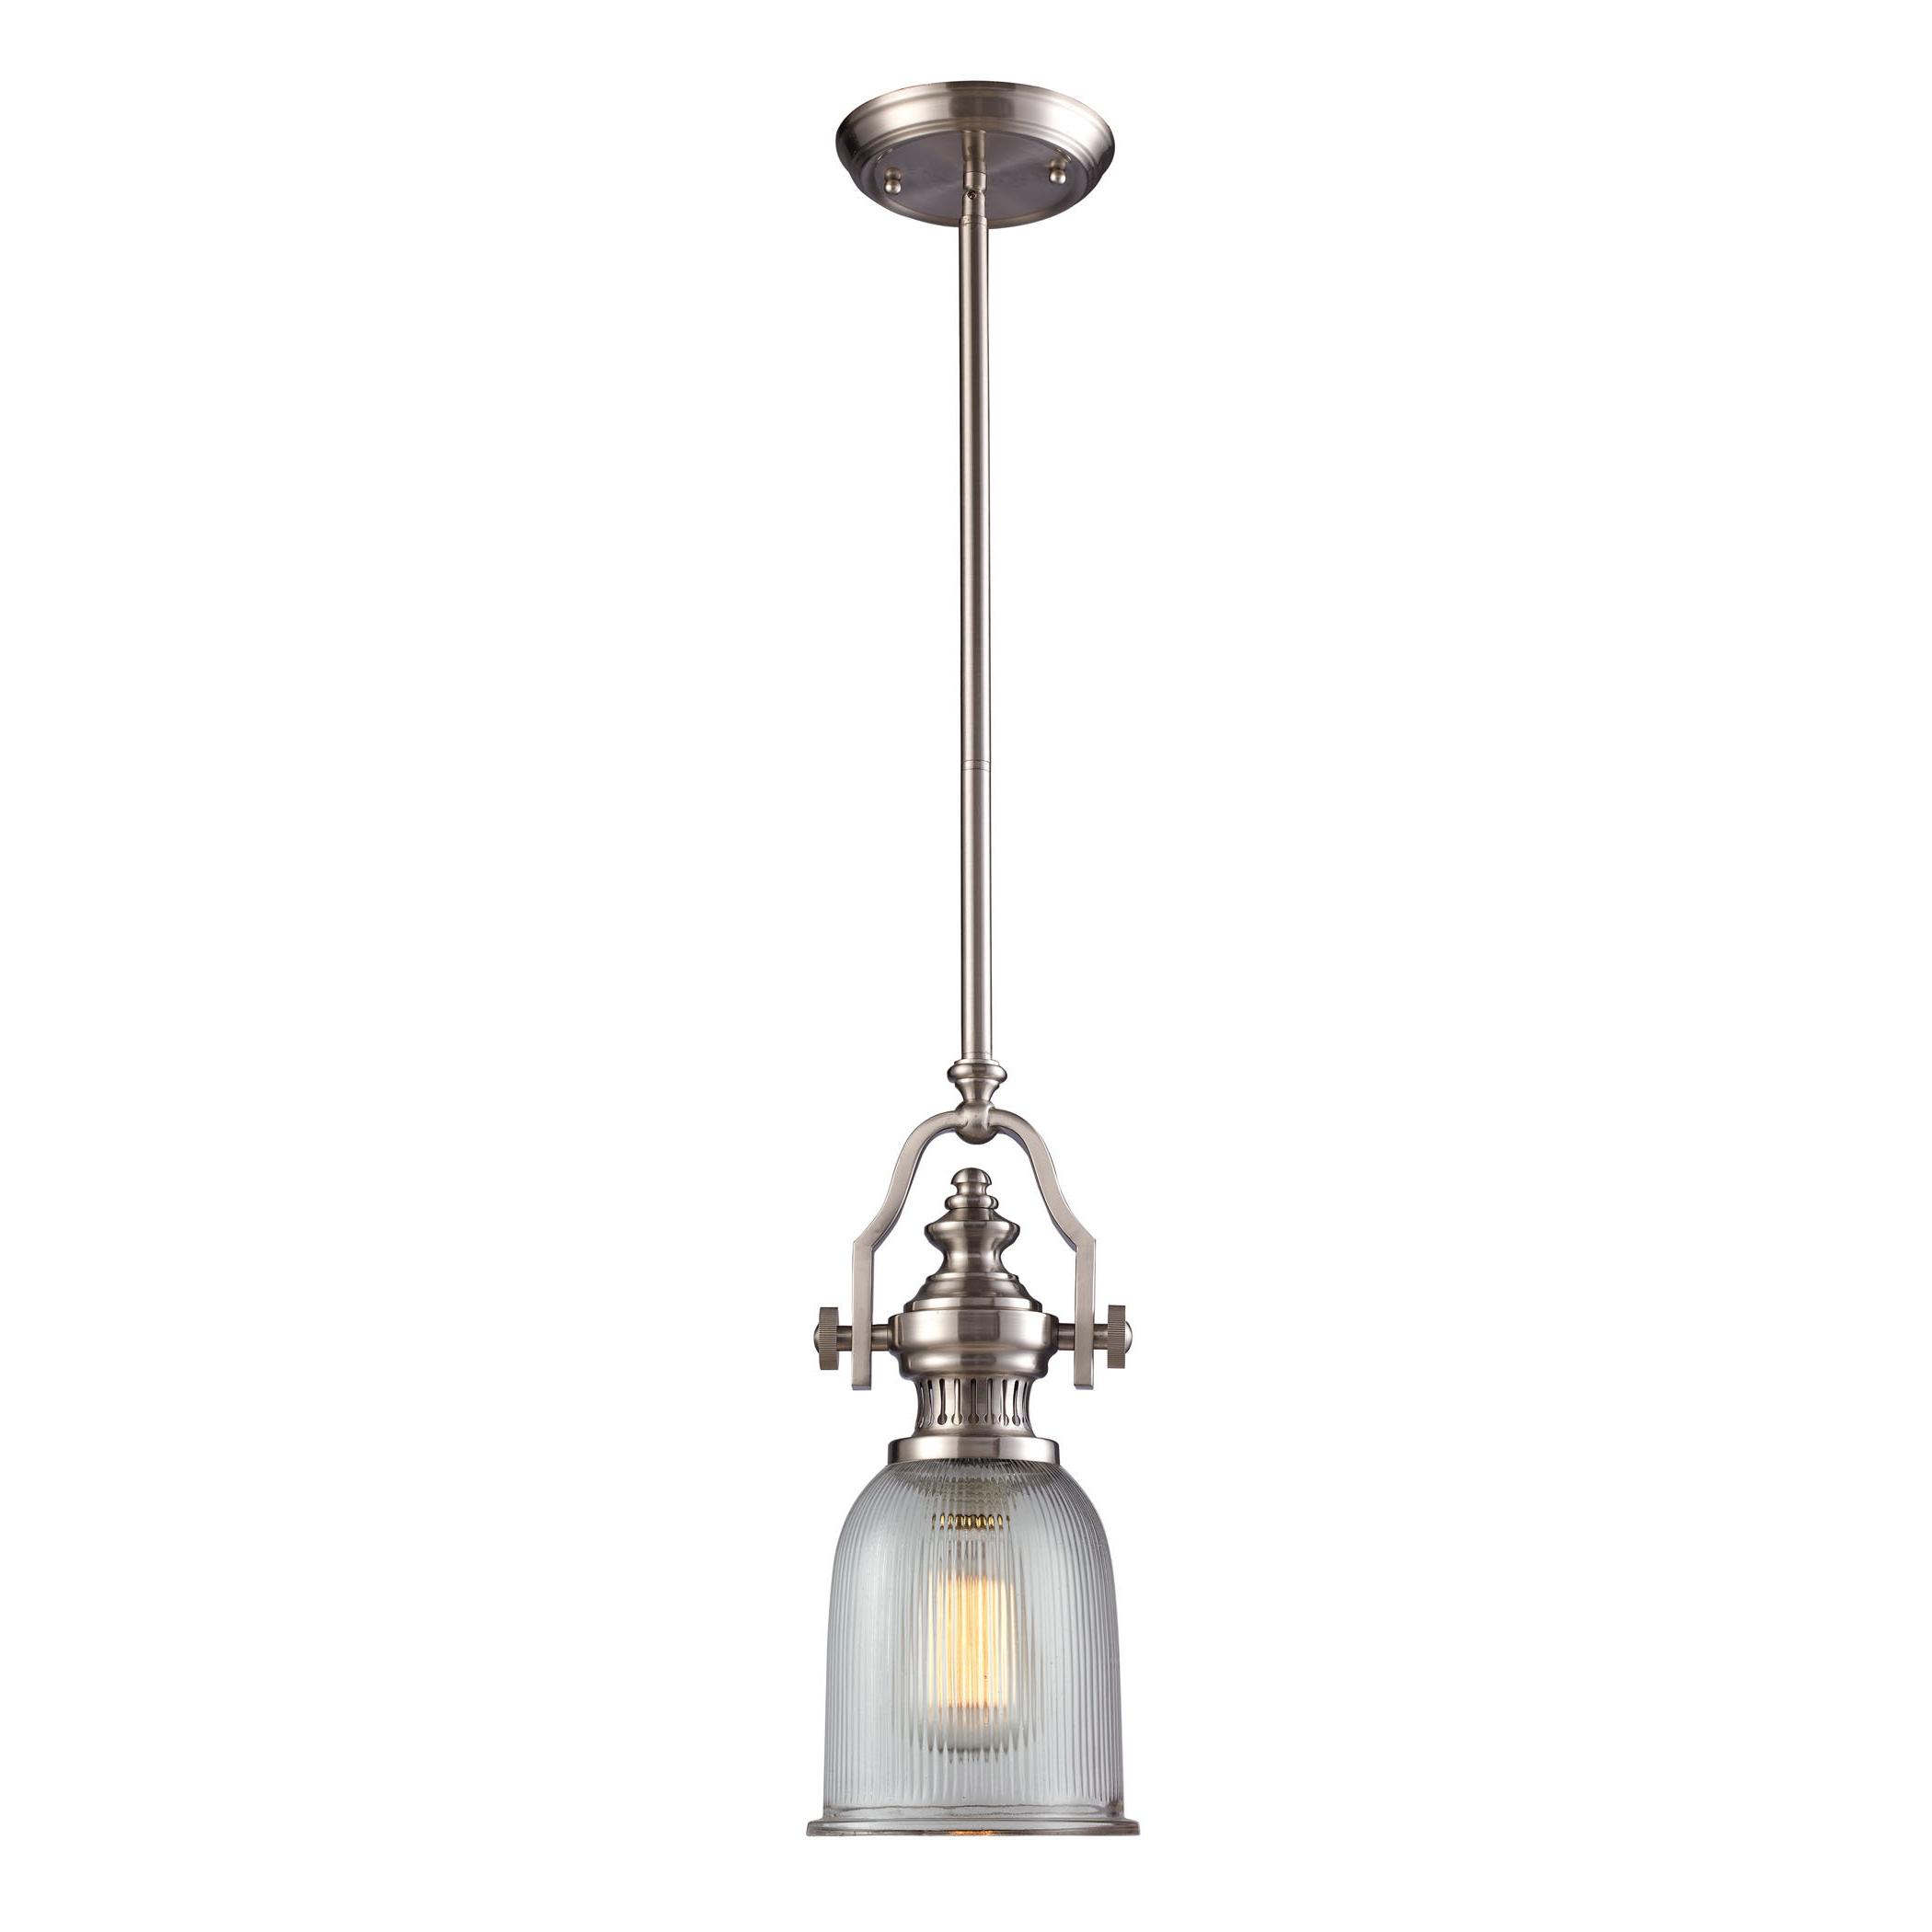 Latest Birch Lane™ Heritage Erico 1 Light Single Bell Pendant Throughout Sargent 1 Light Single Bell Pendants (View 5 of 20)